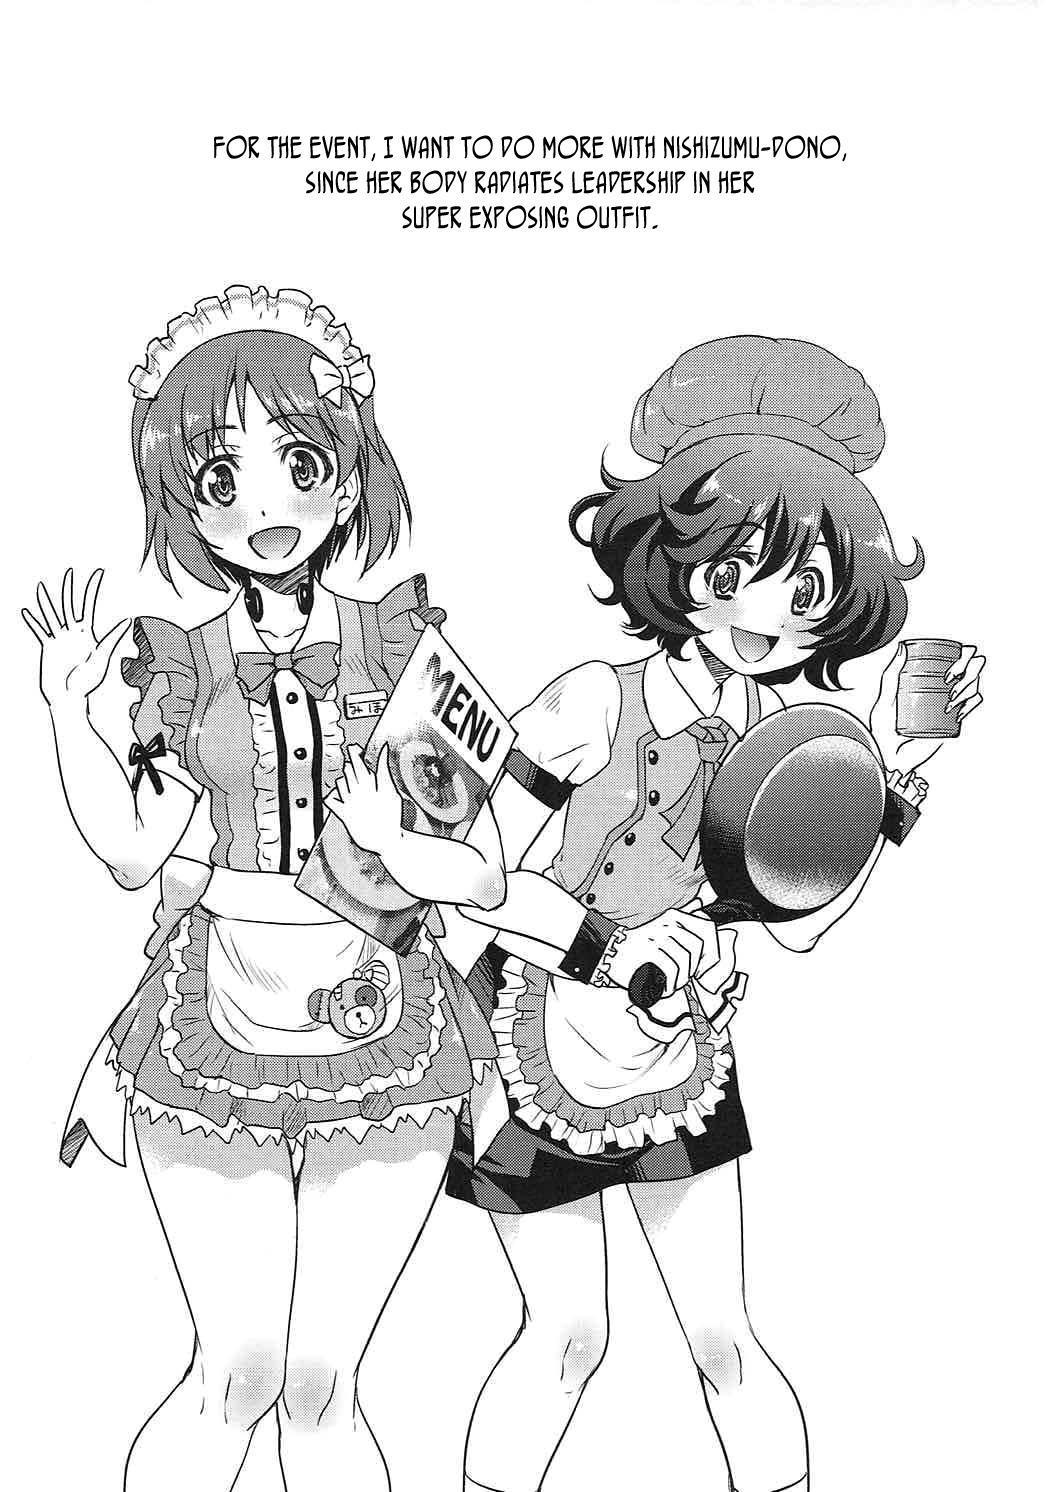 (COMIC1☆11) [Ponyfarm (Inoue Yoshihisa)] Darjeeling-sama no Drink Bar | Darjeeling-sama's Drink Bar (Girls und Panzer) [English] [CrowKarasu] 15